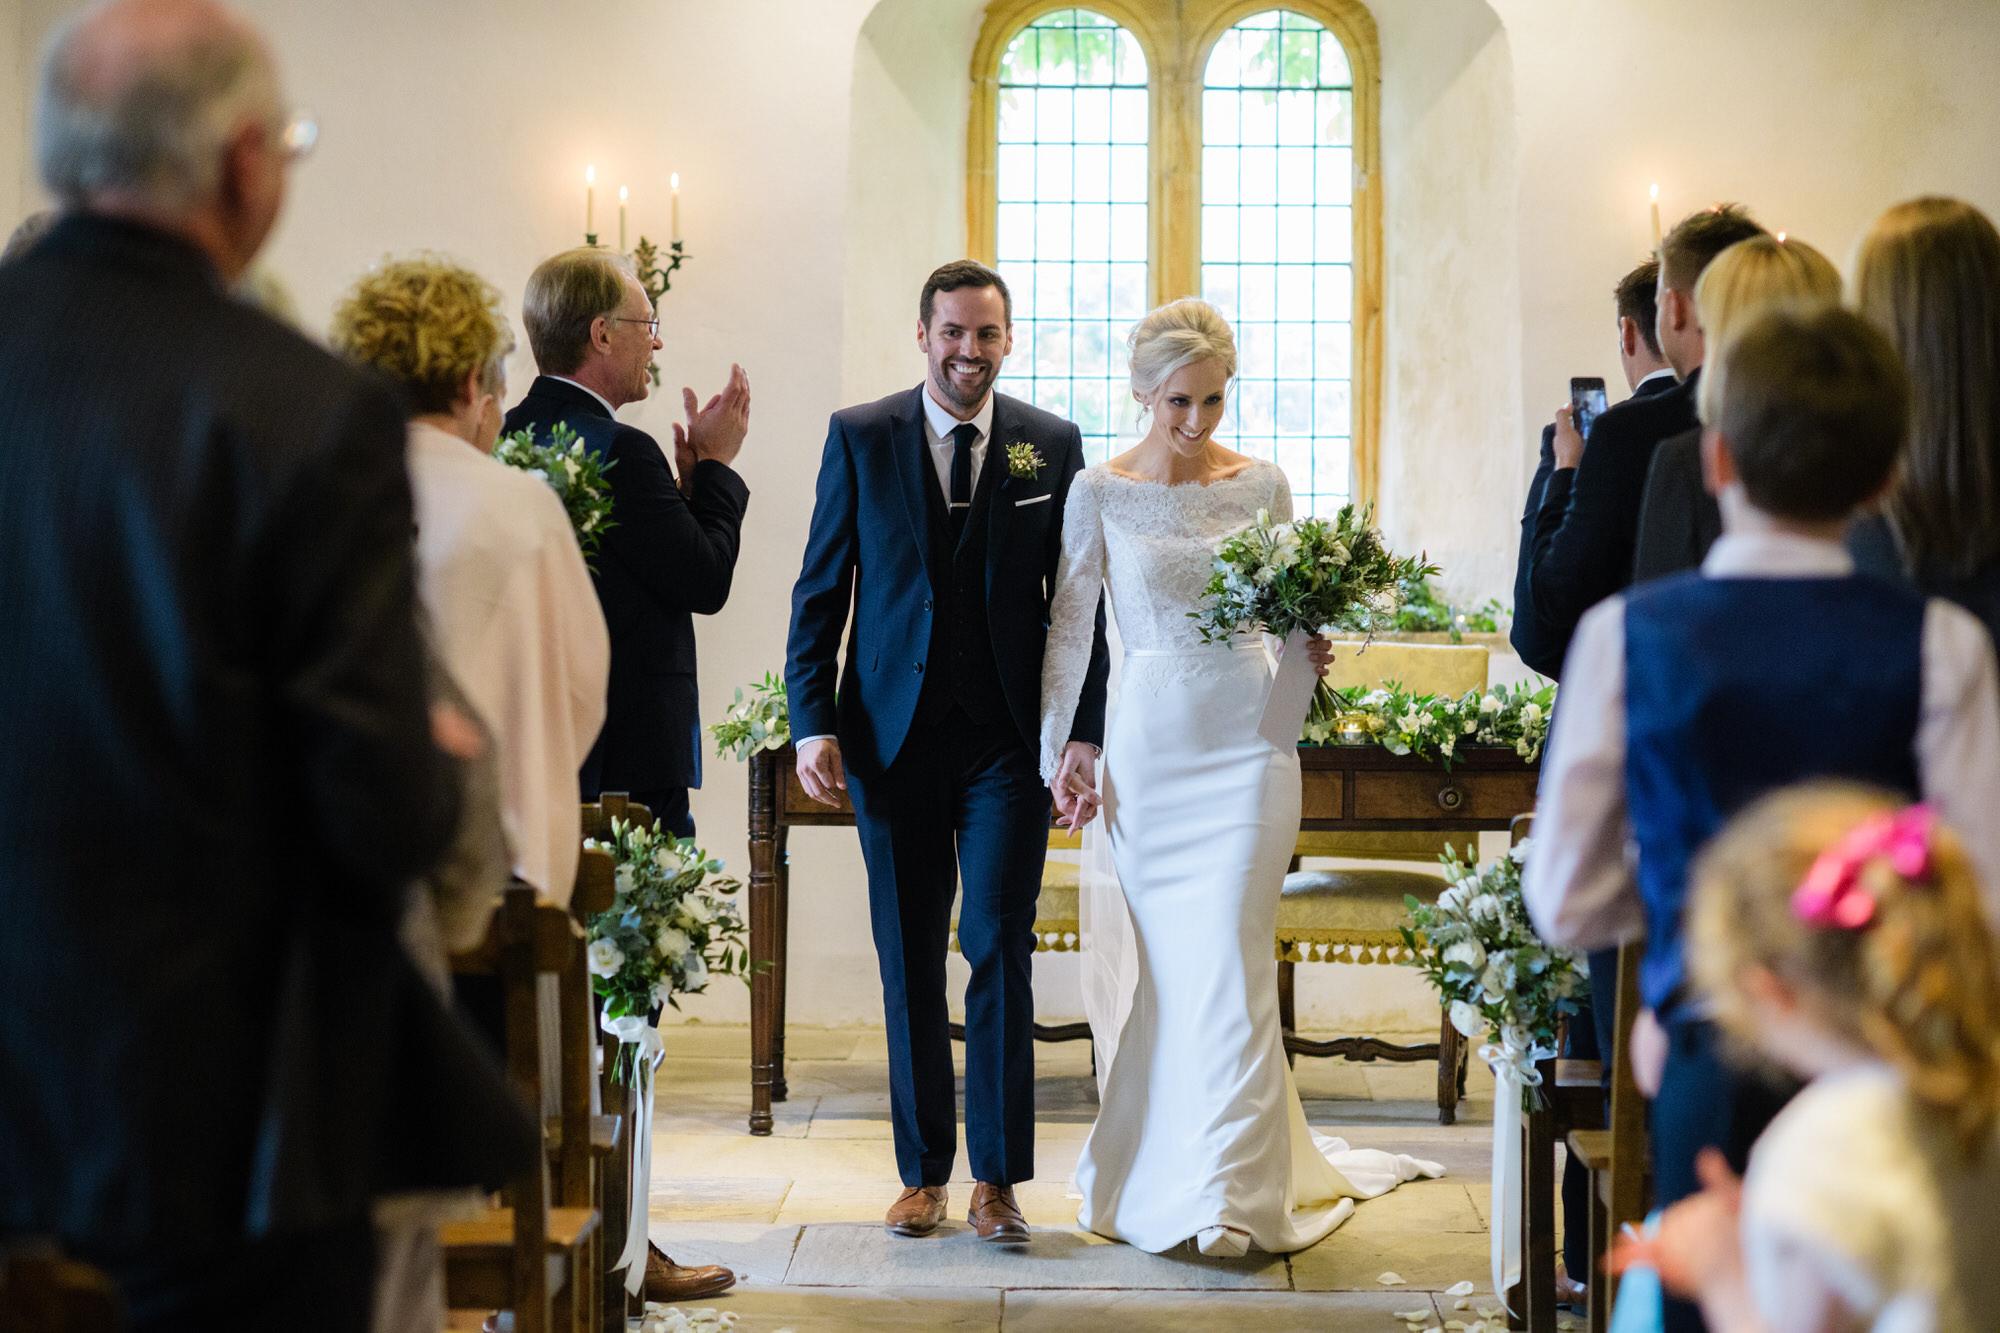 Brympton House wedding ceremony by simon biffen photography 22